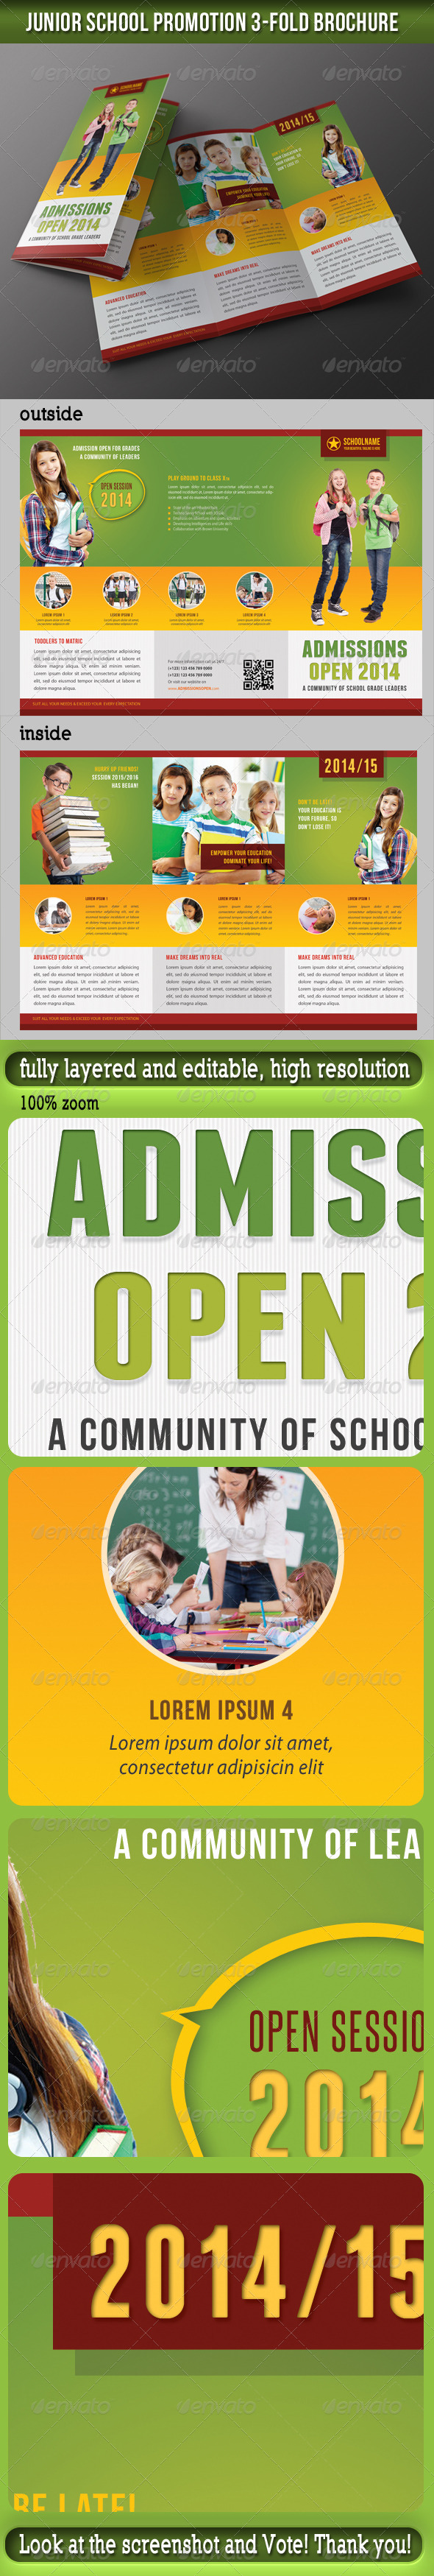 GraphicRiver Junior School Promotion 3-Fold Brochure 03 7140358